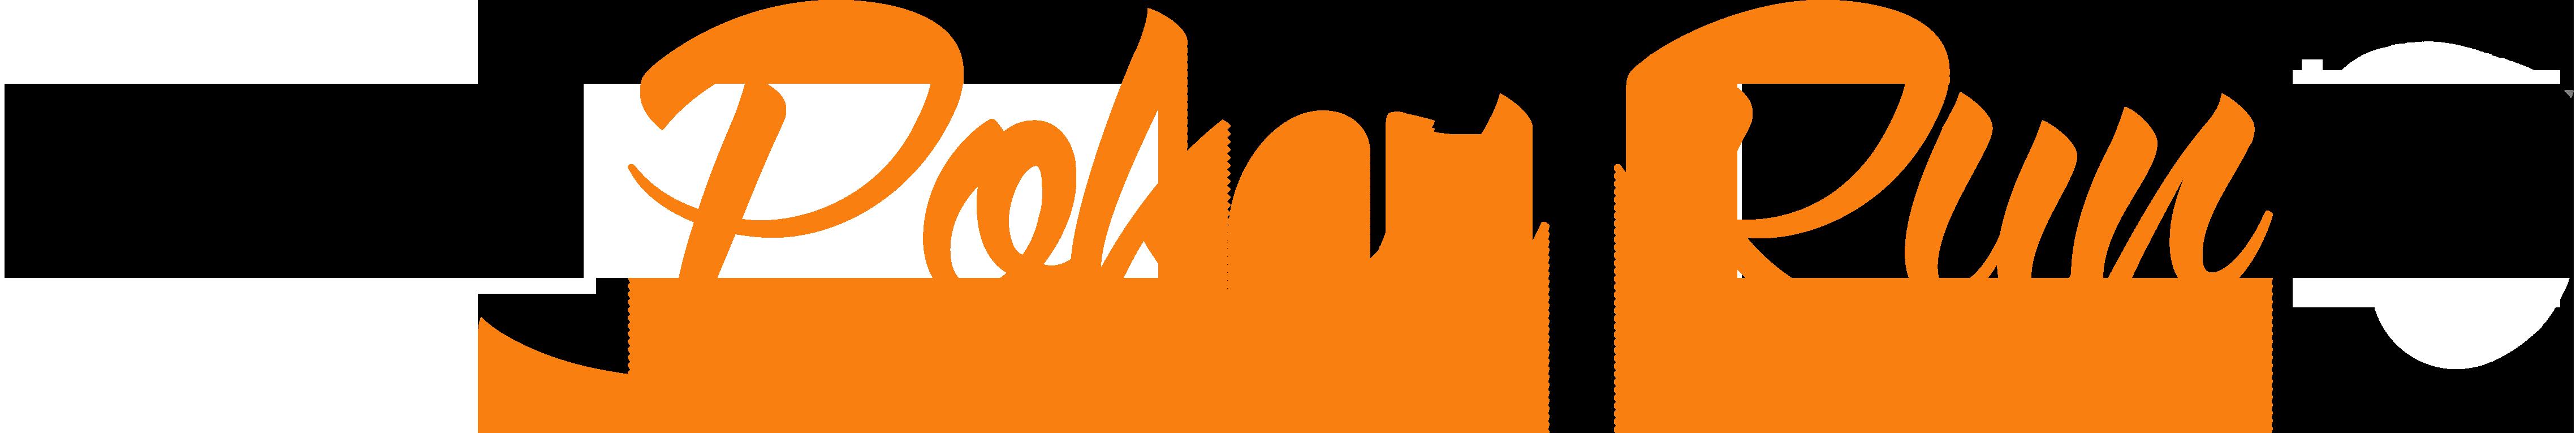 SPR logo 20